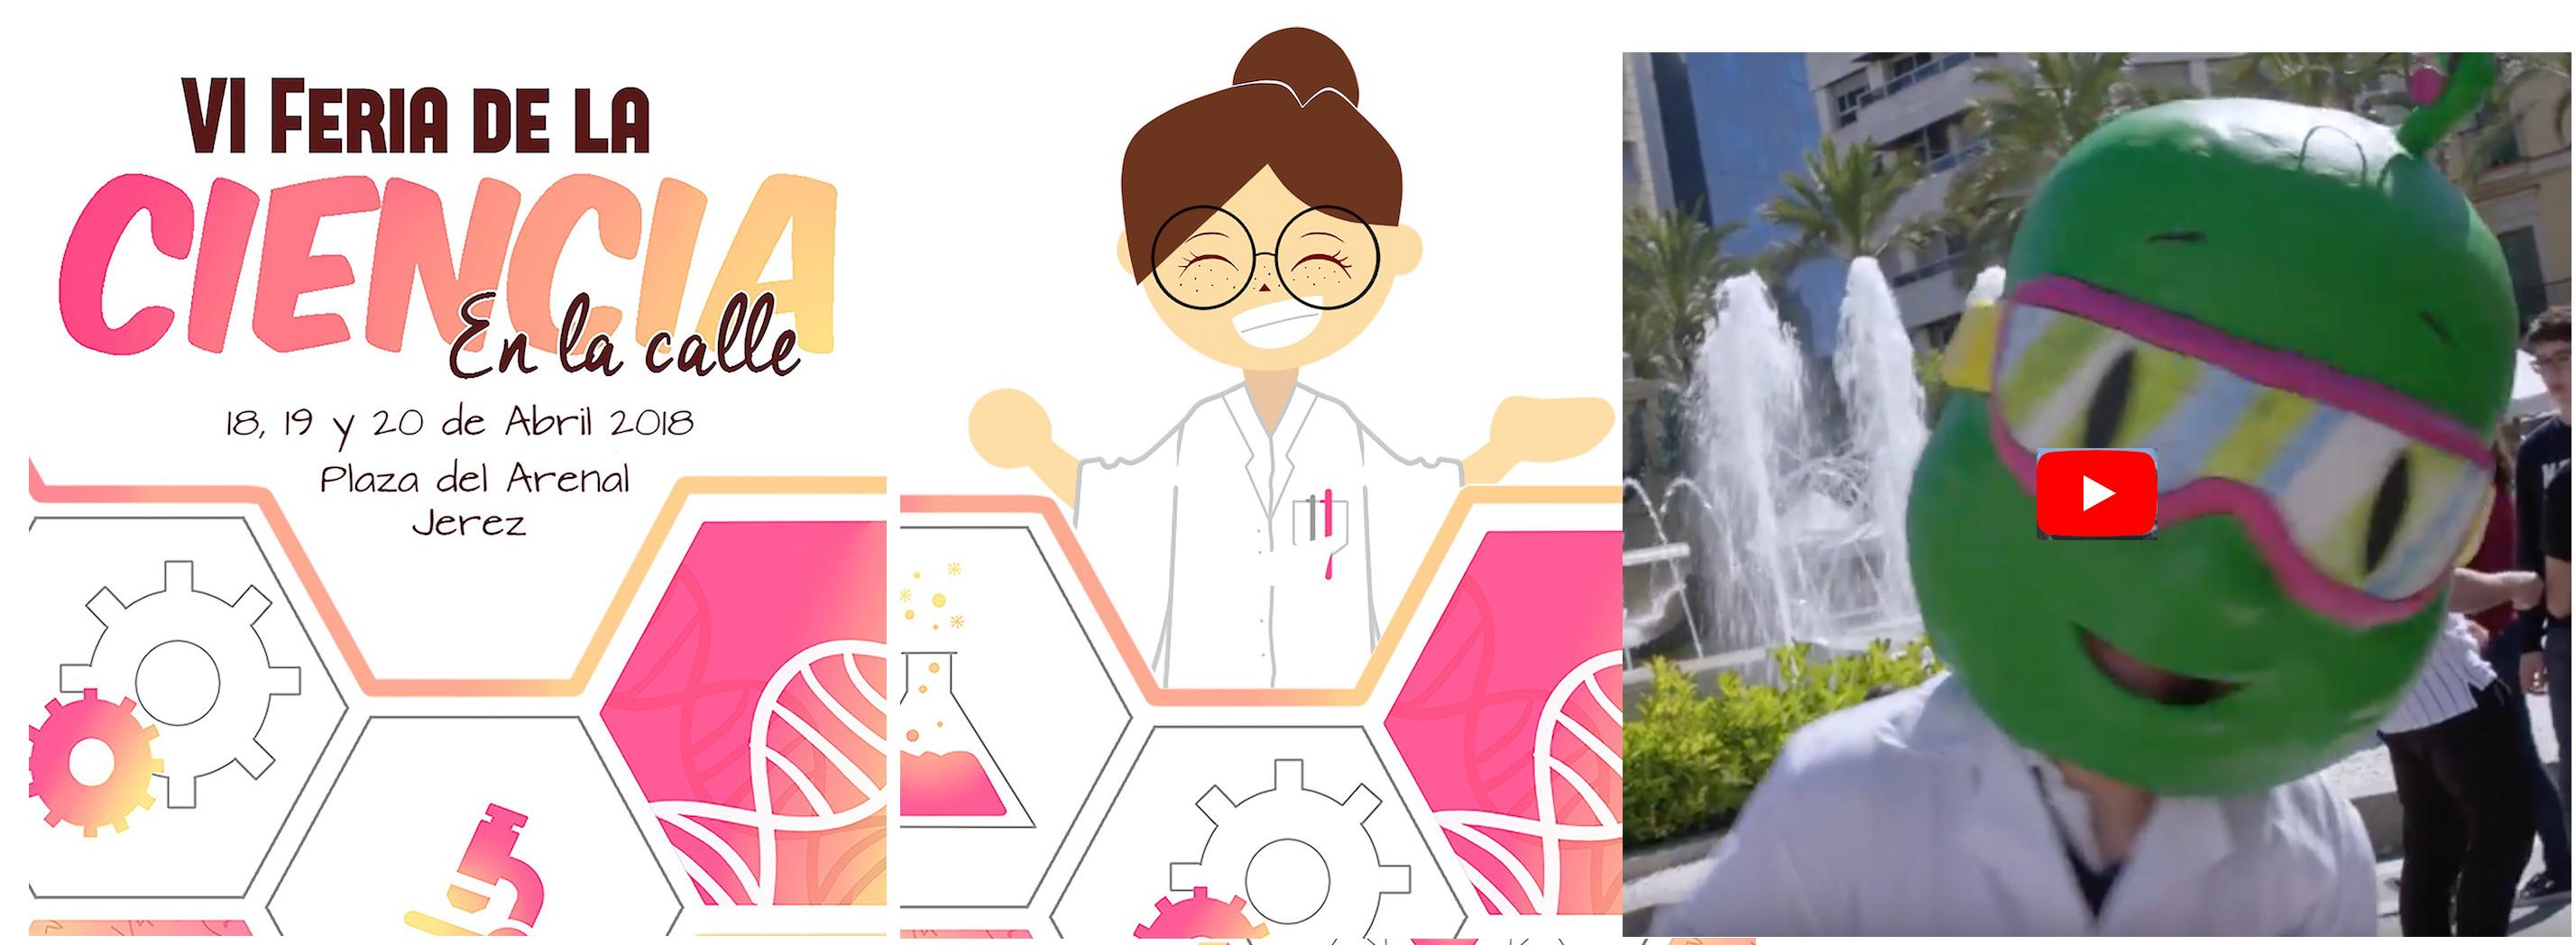 Videos_VI_feria_ciencia